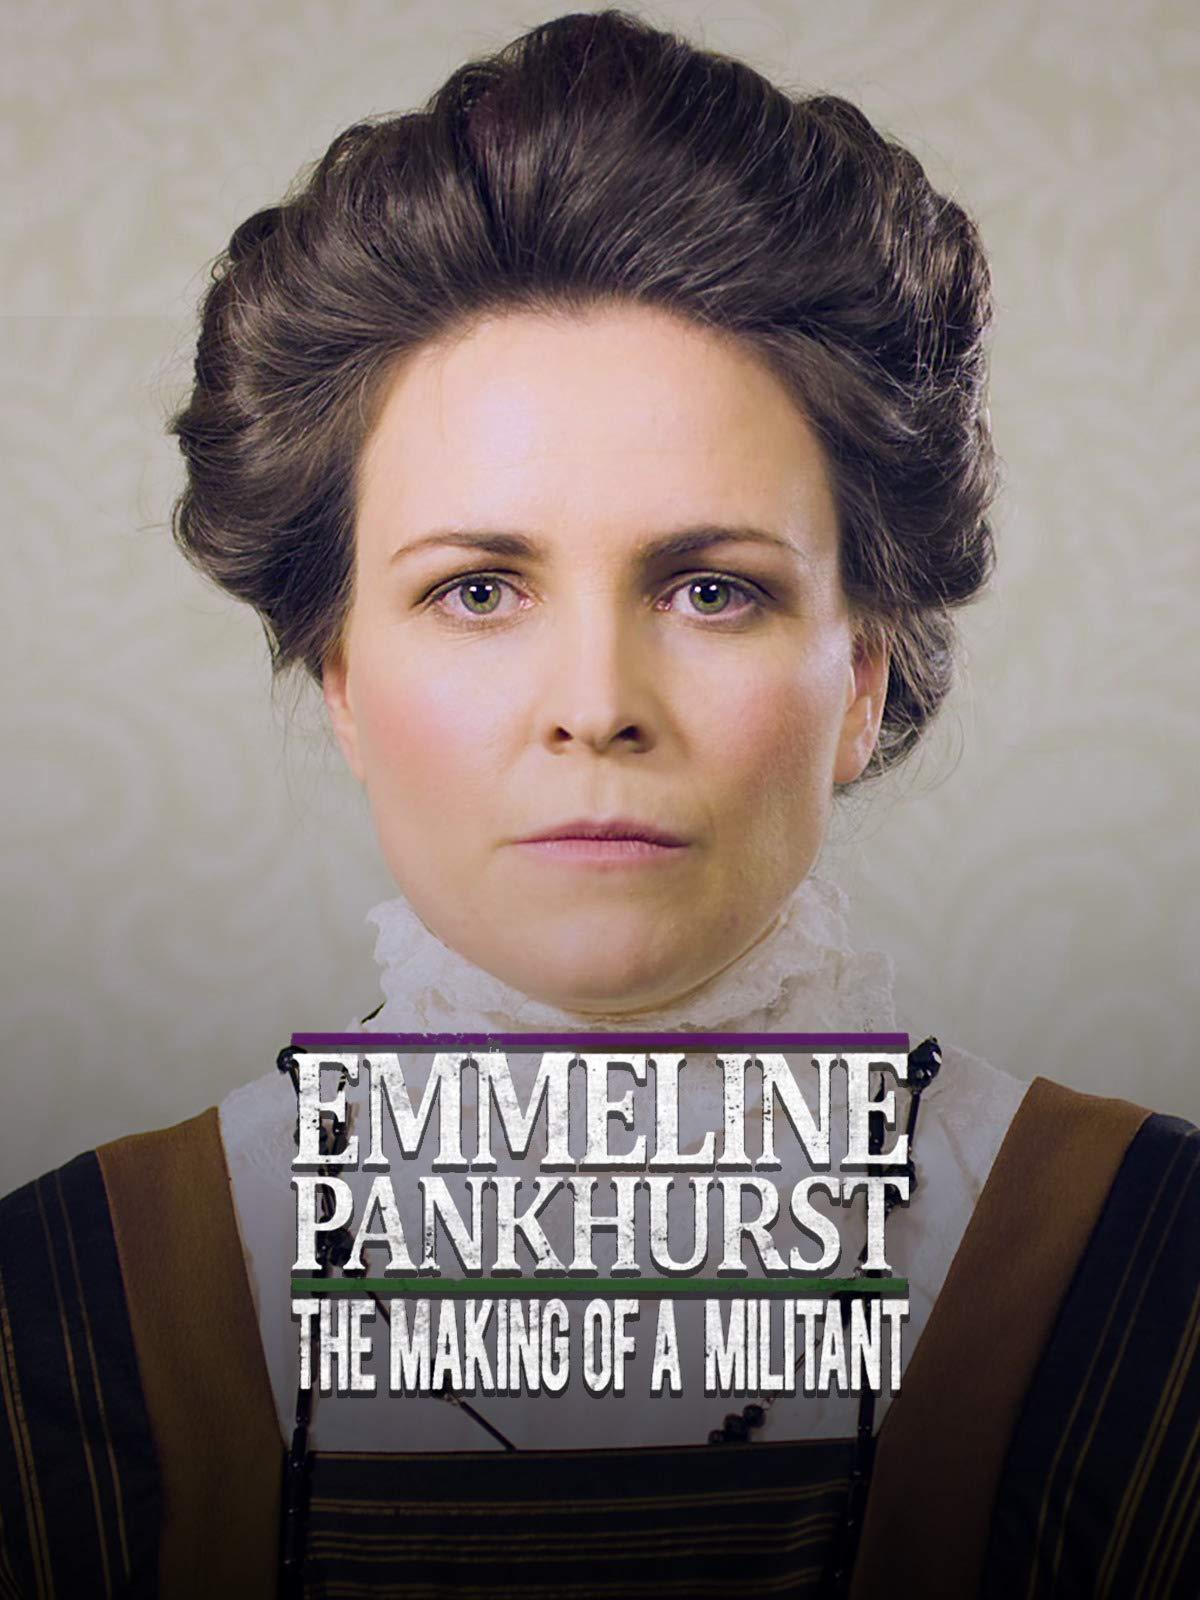 Emmeline Pankhurst The Making of a Militant on Amazon Prime Video UK